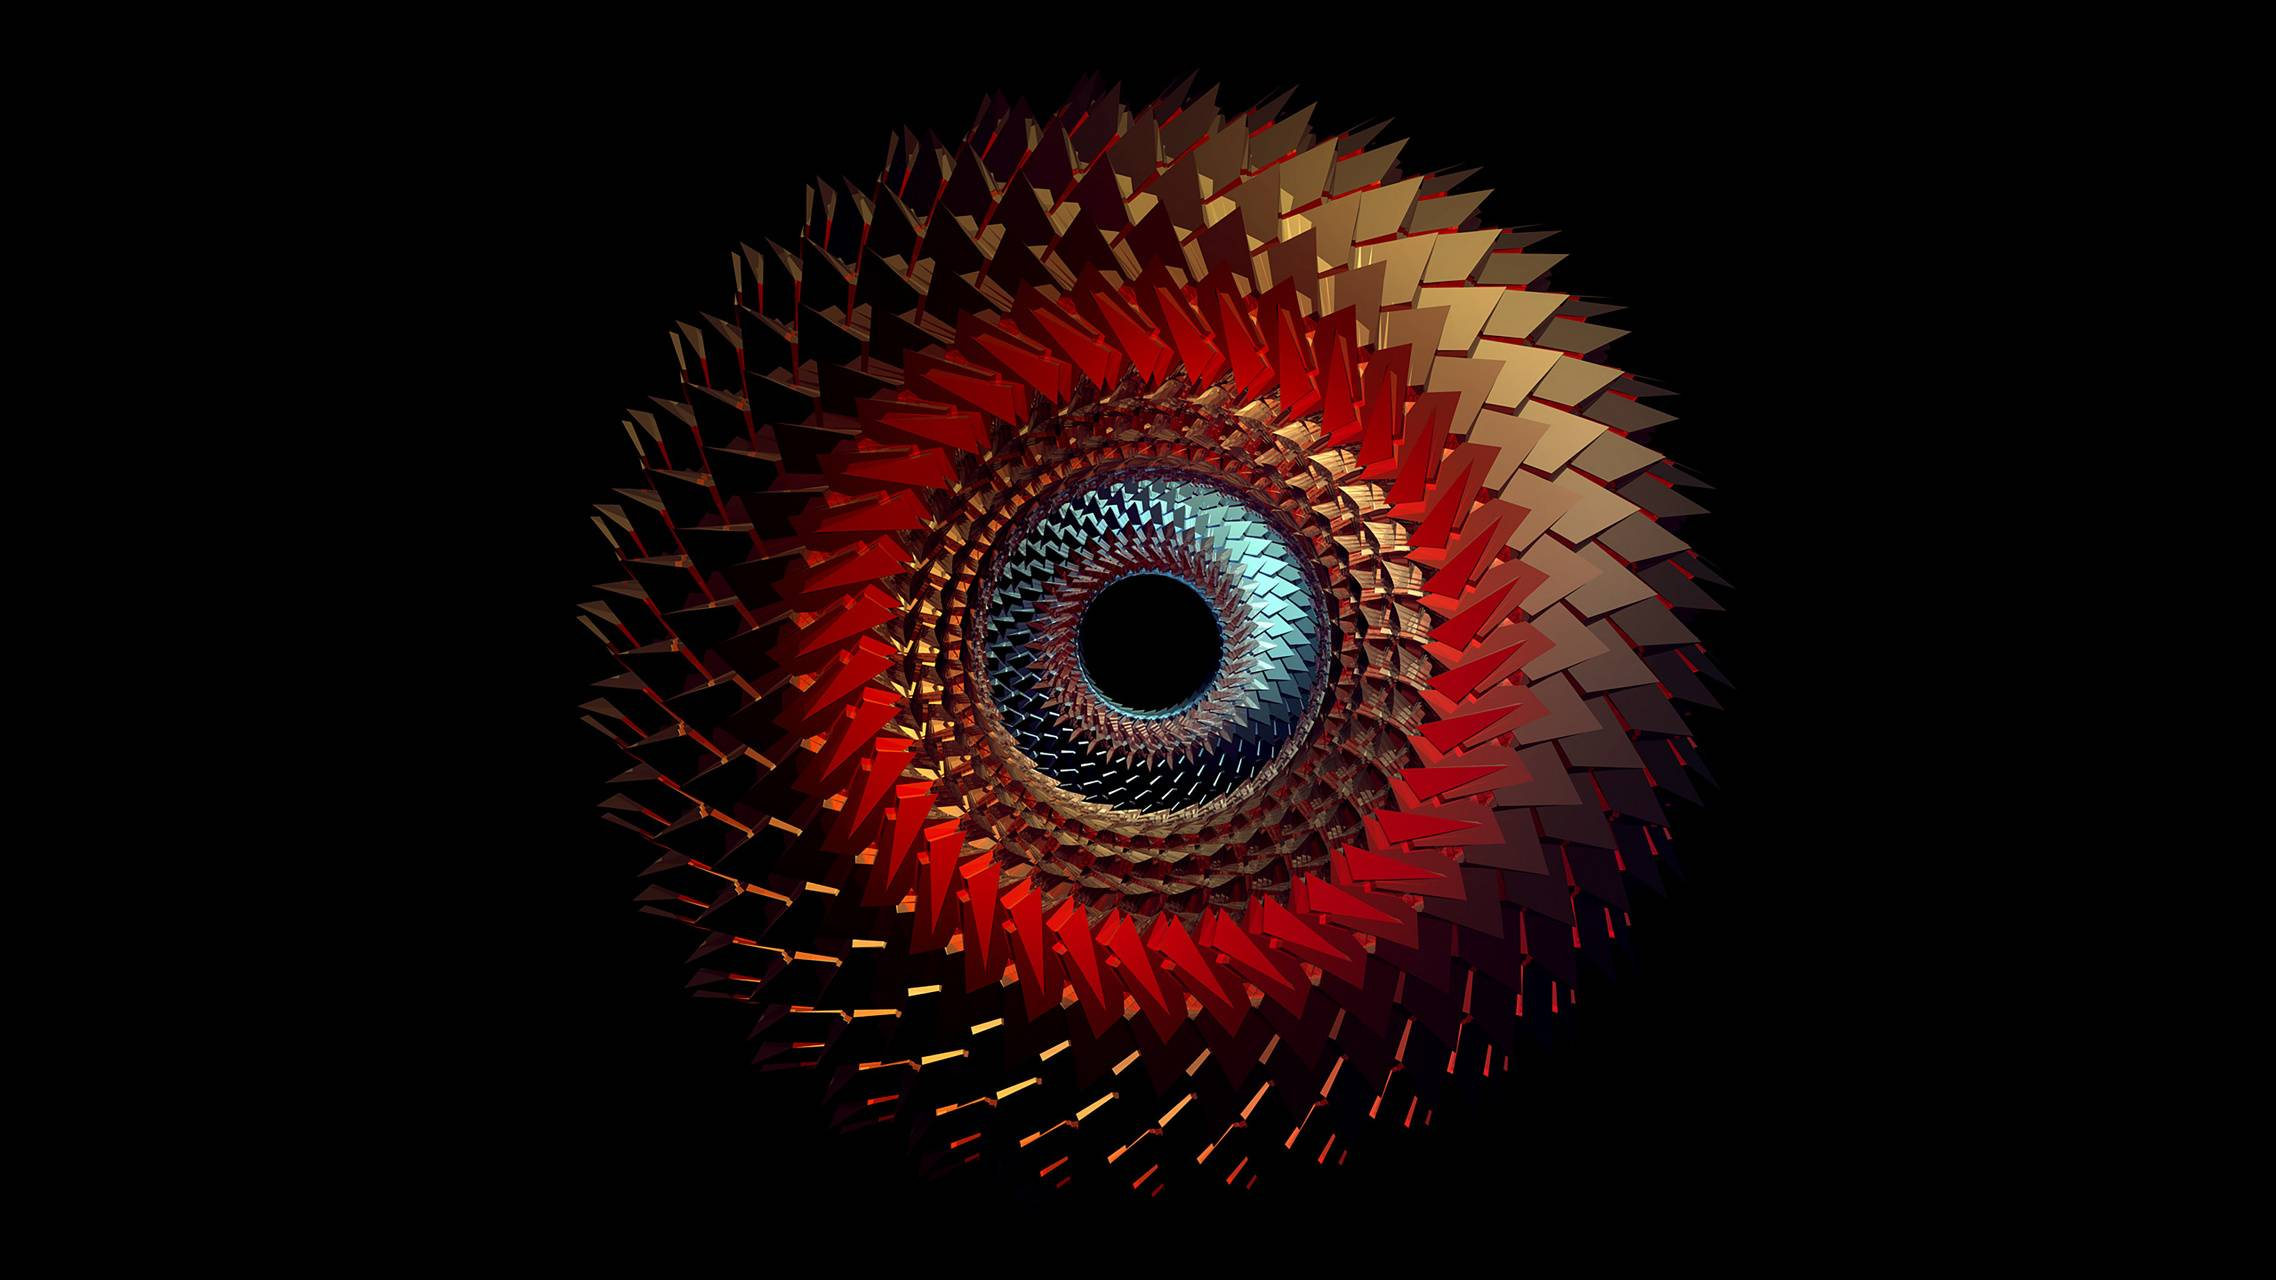 Abstract Spiral Eye